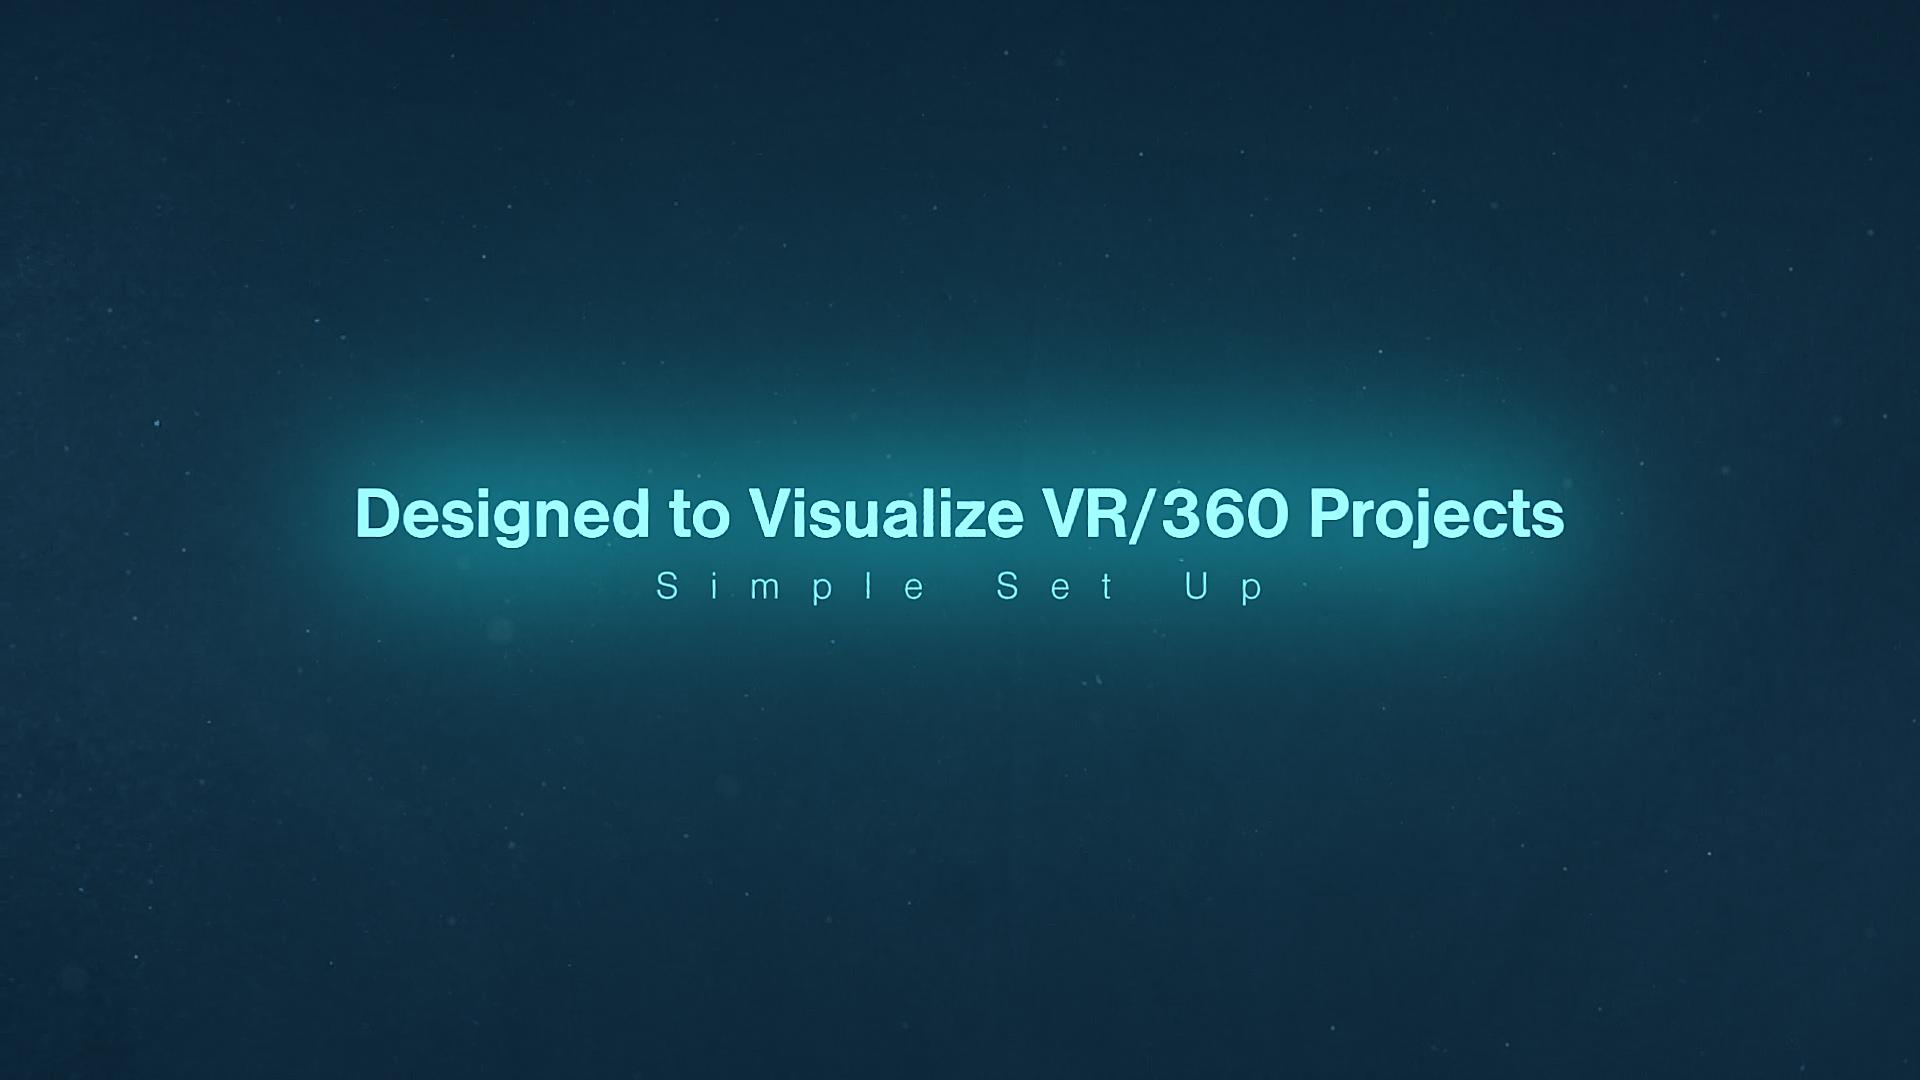 VR_360_Promo_Pitch_1080p_01602